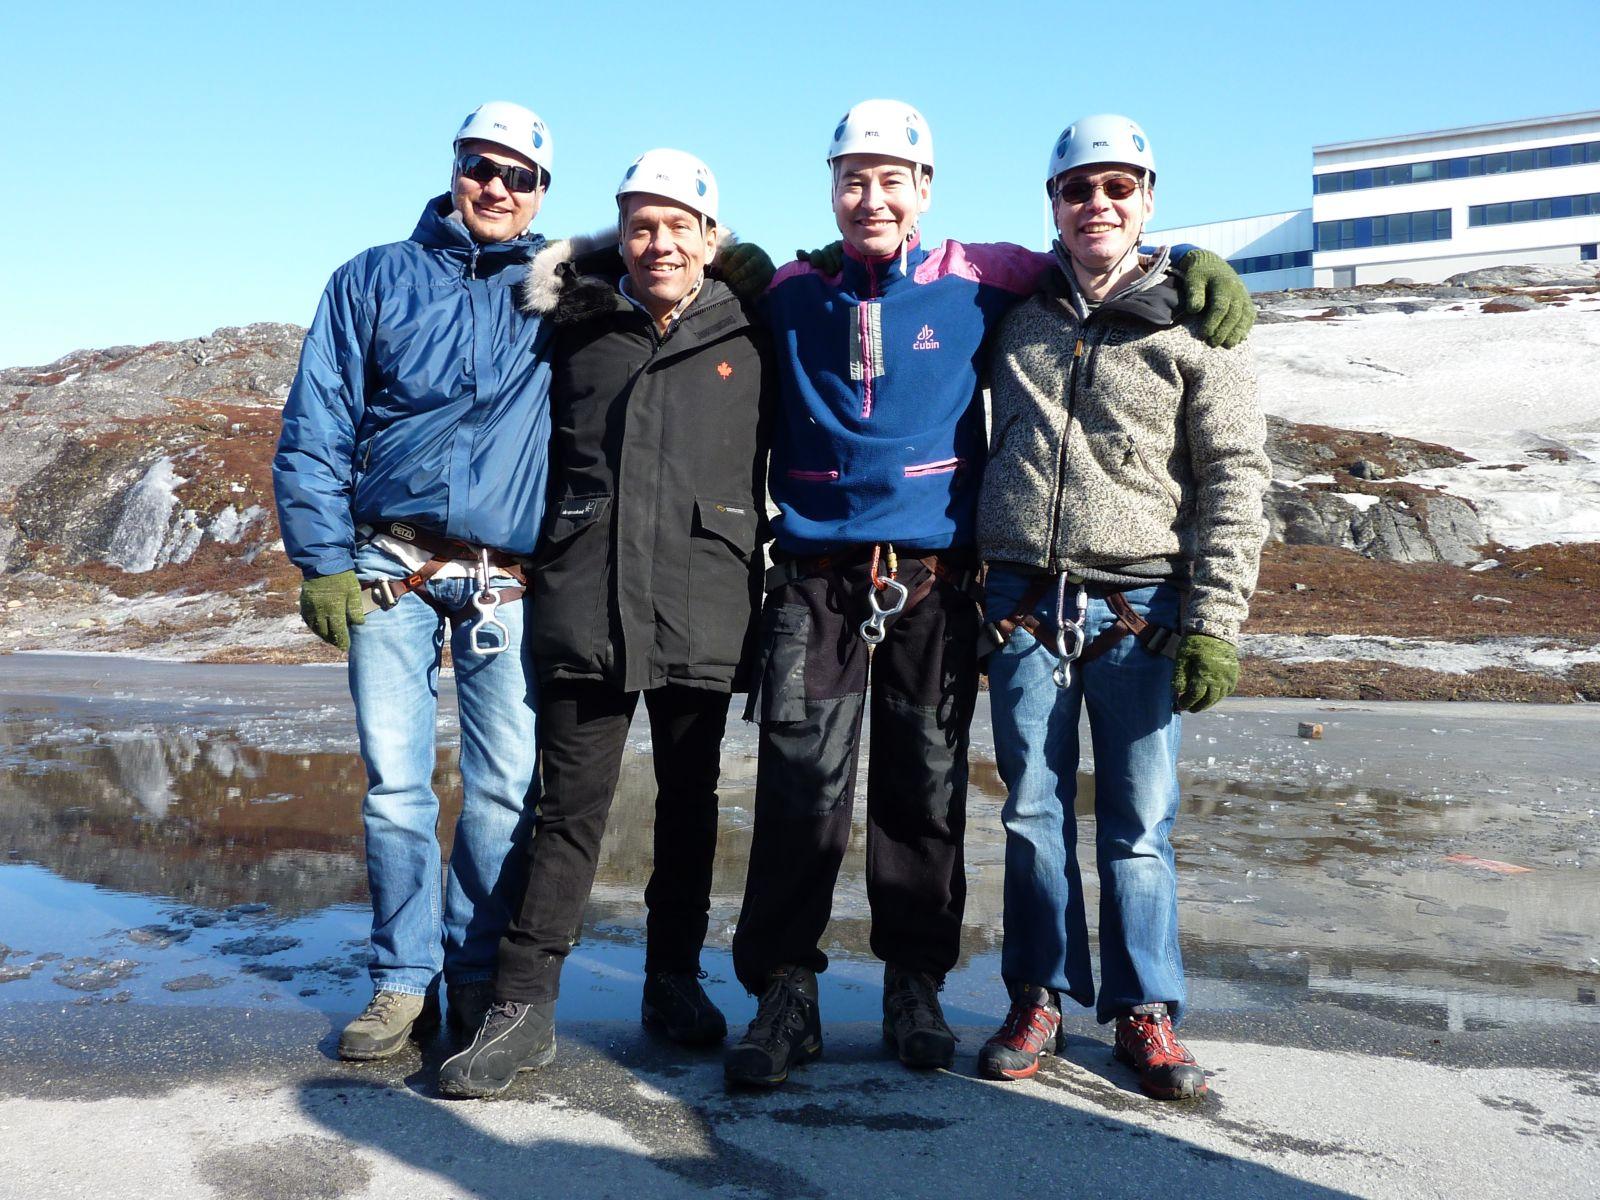 2010-04-10-1615_-_Henrik Steinbacher; Jesper Eugenius Labansen; John Telling; Svend Sværd